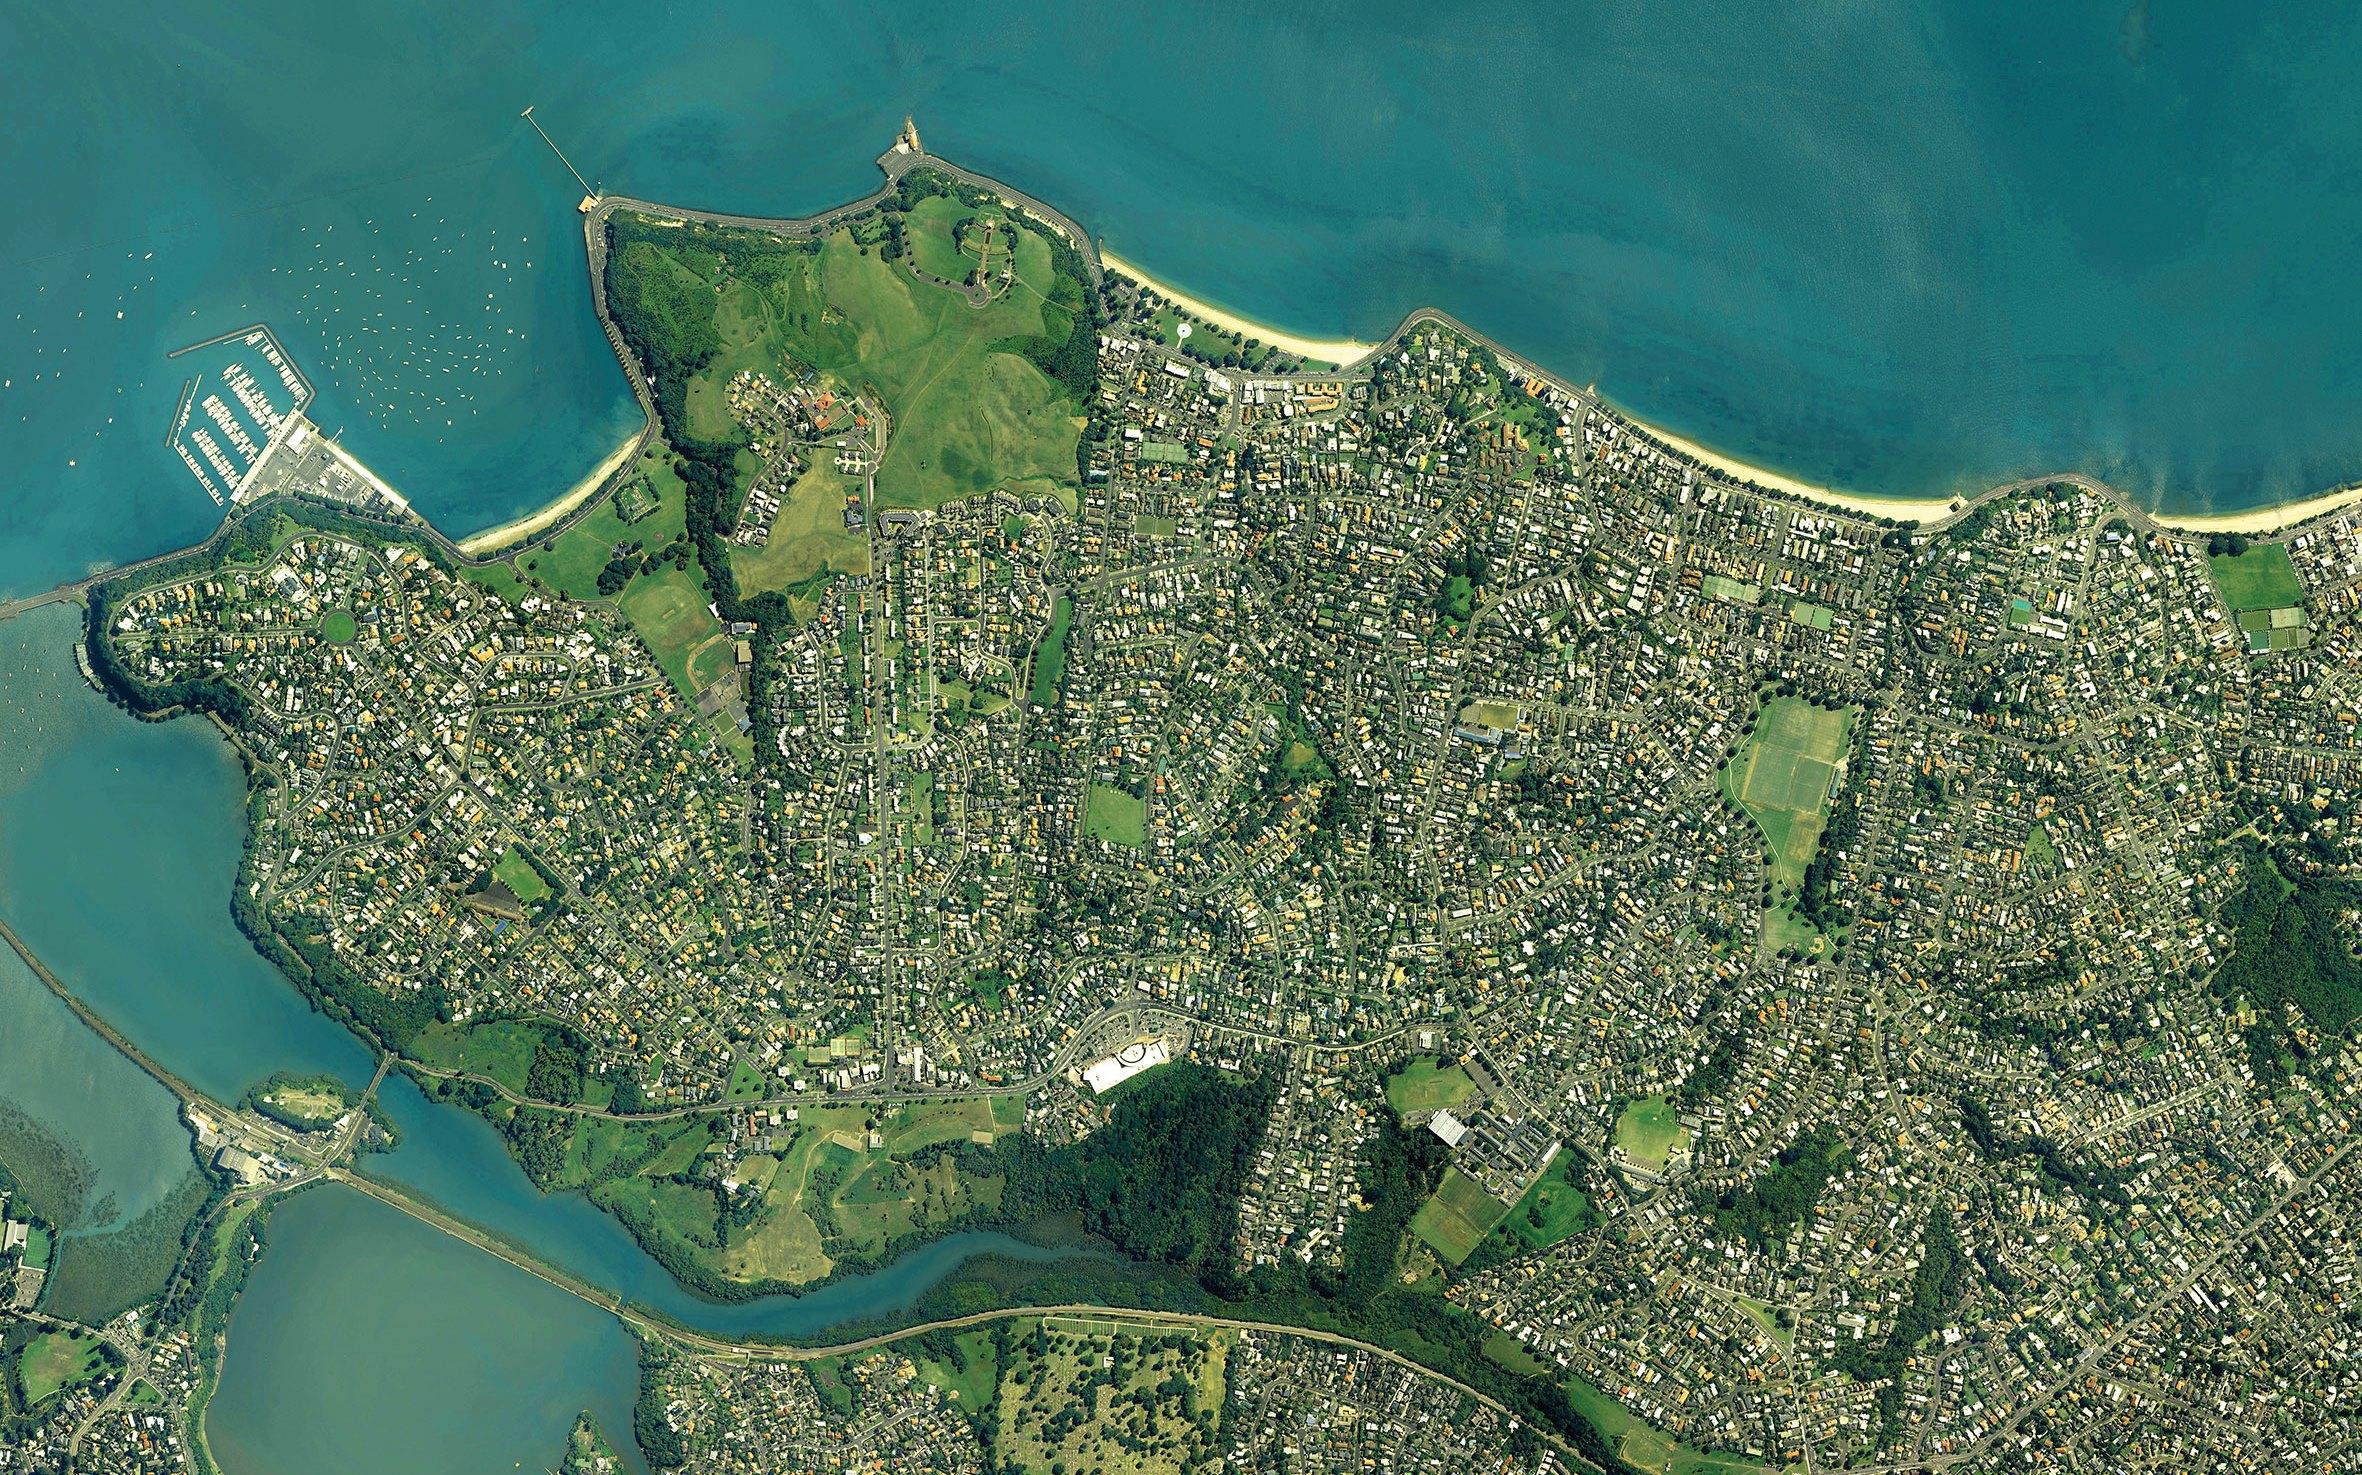 Orakei-Peninsula-Auckland-City-Council-cropped.jpg